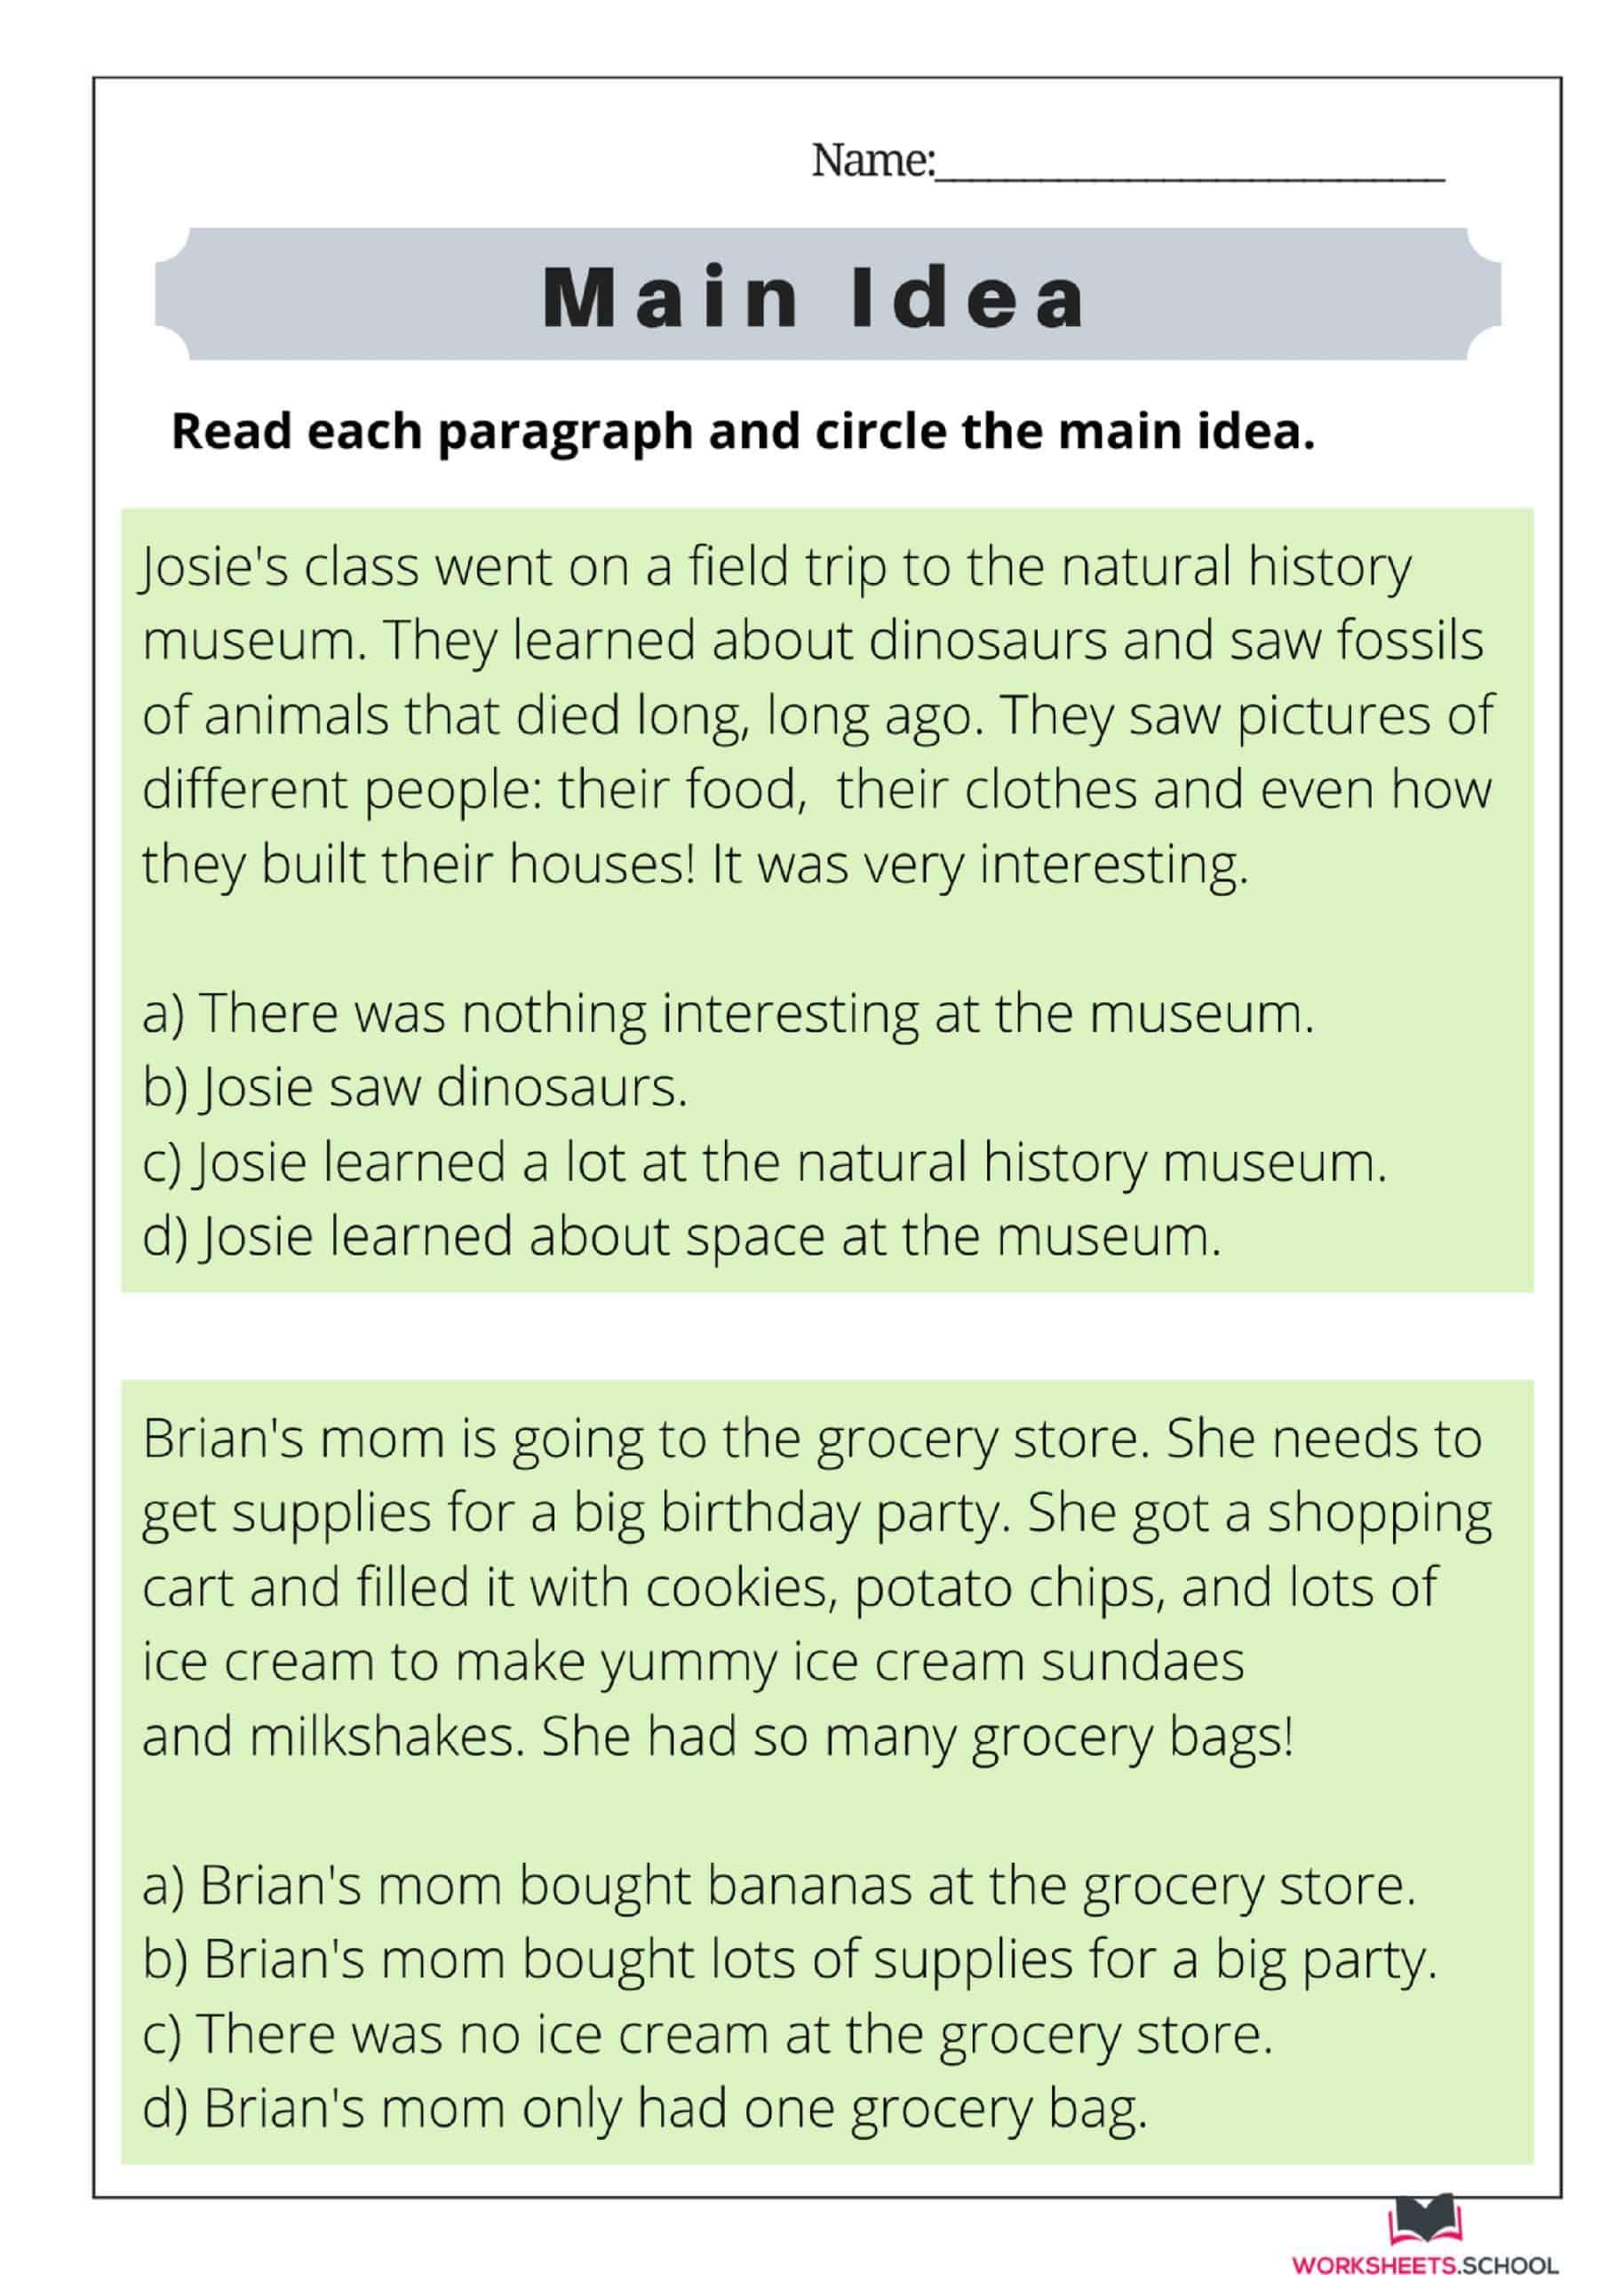 Main Idea Worksheet 07